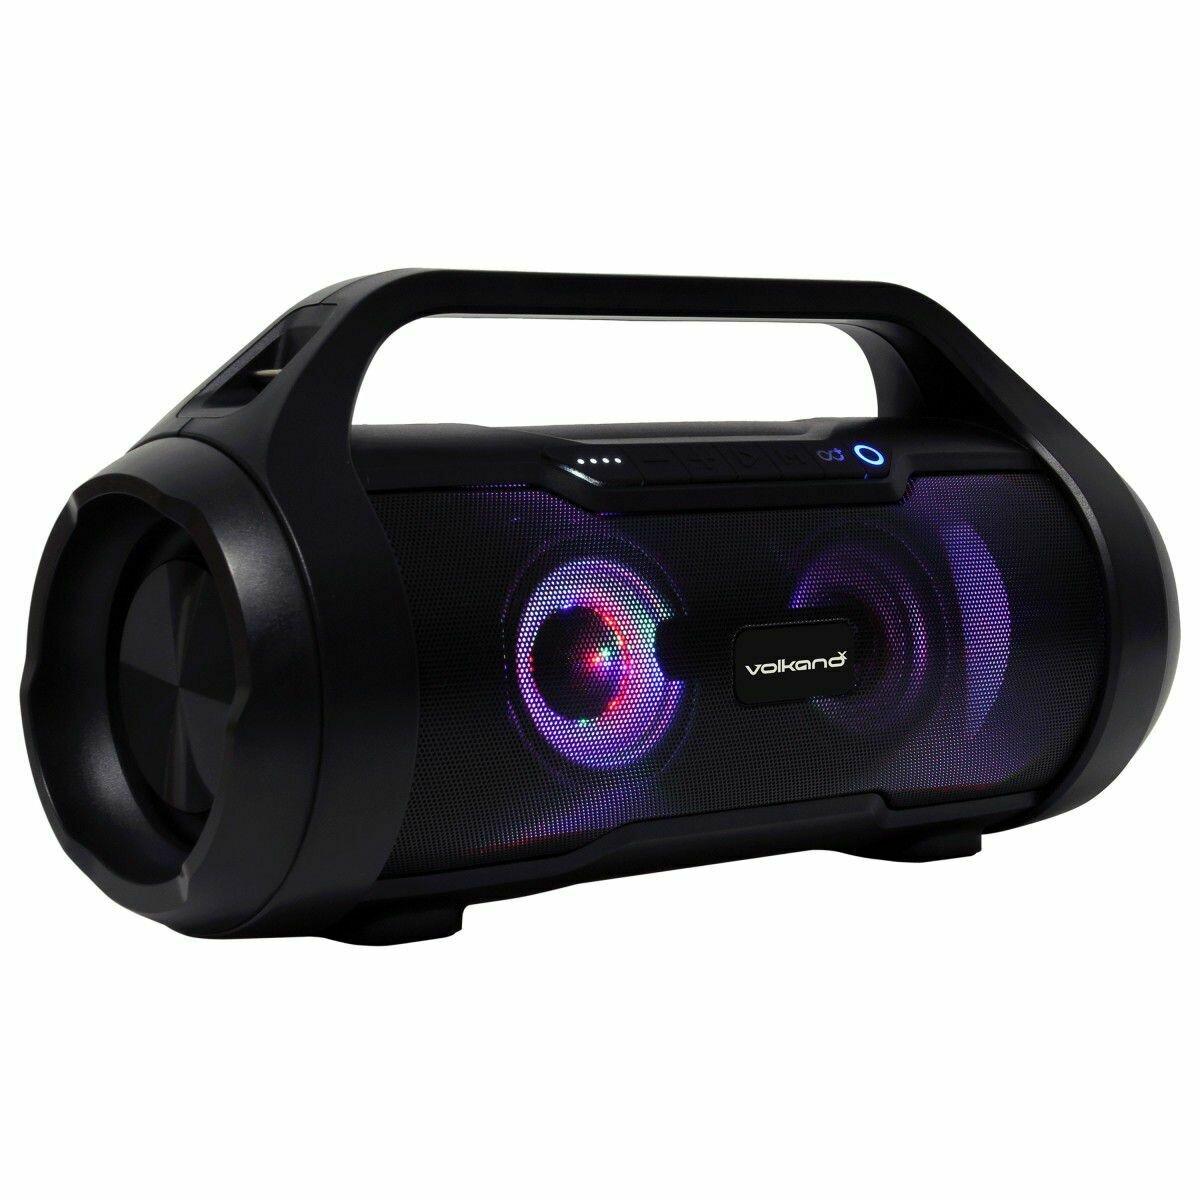 VolkanoX Cobra Series Bluetooth Speaker - Black